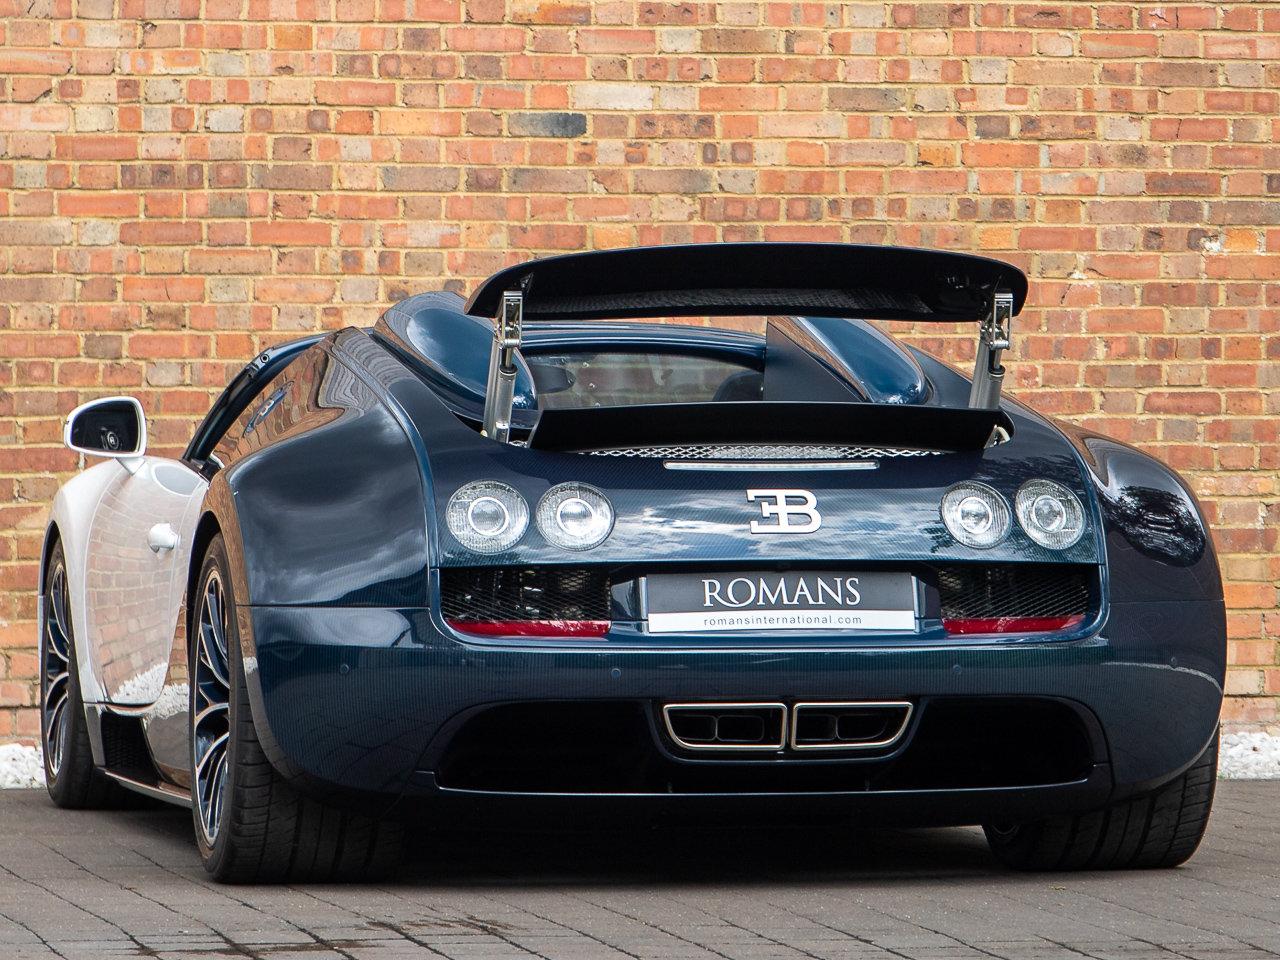 2014 Bugatti Veyron Grand Sport Vitesse For Sale | Car And ...